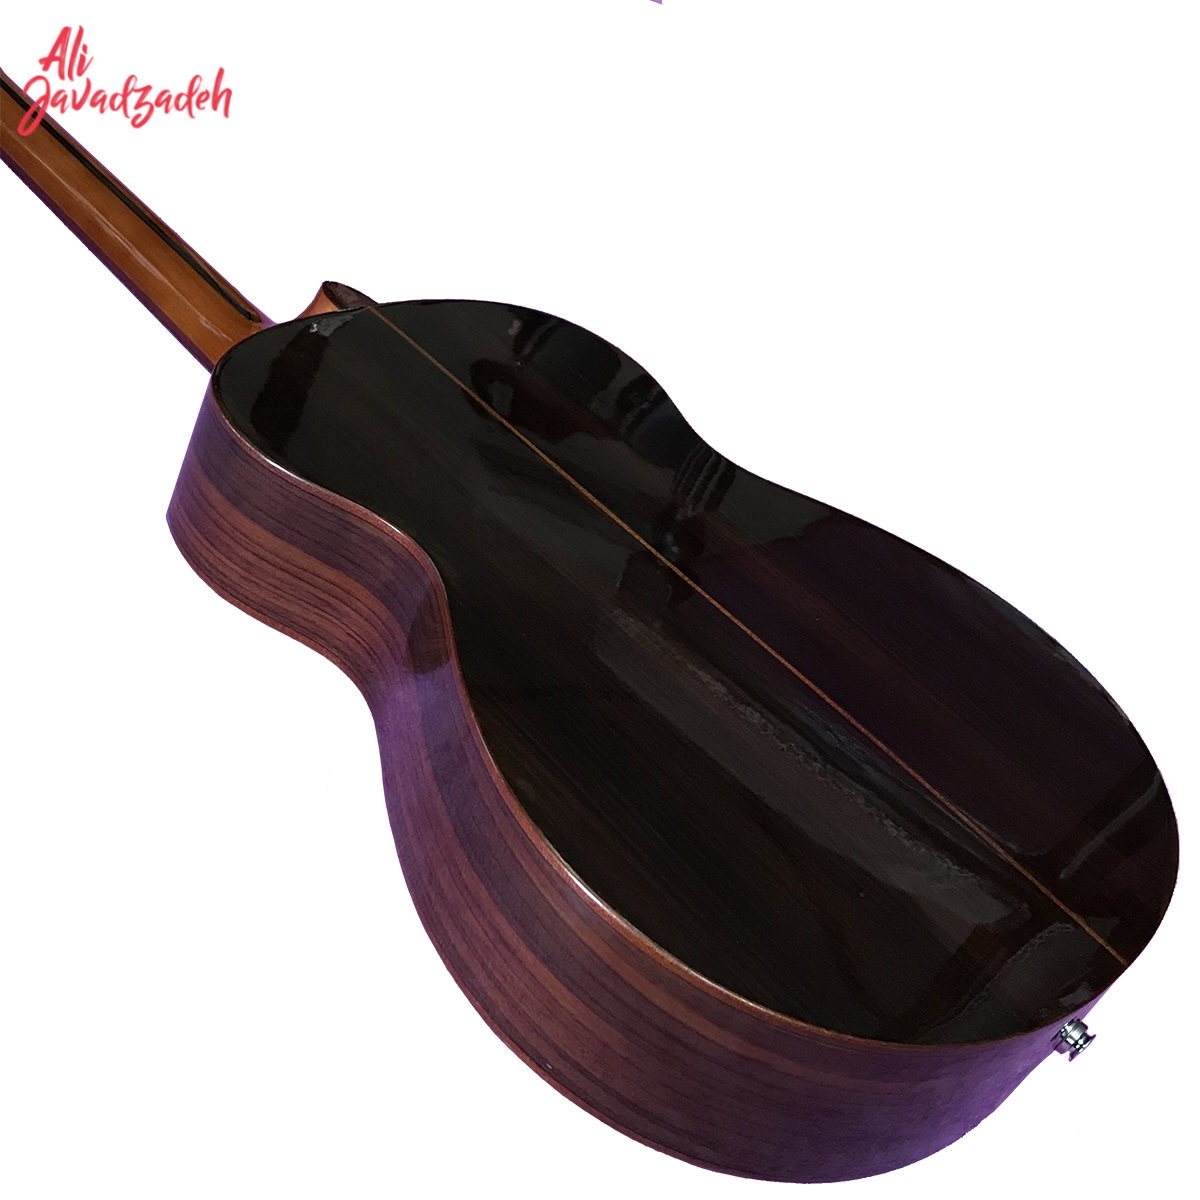 گیتار کلاسیک کوردوبا مدل Rodriguez CWTBP